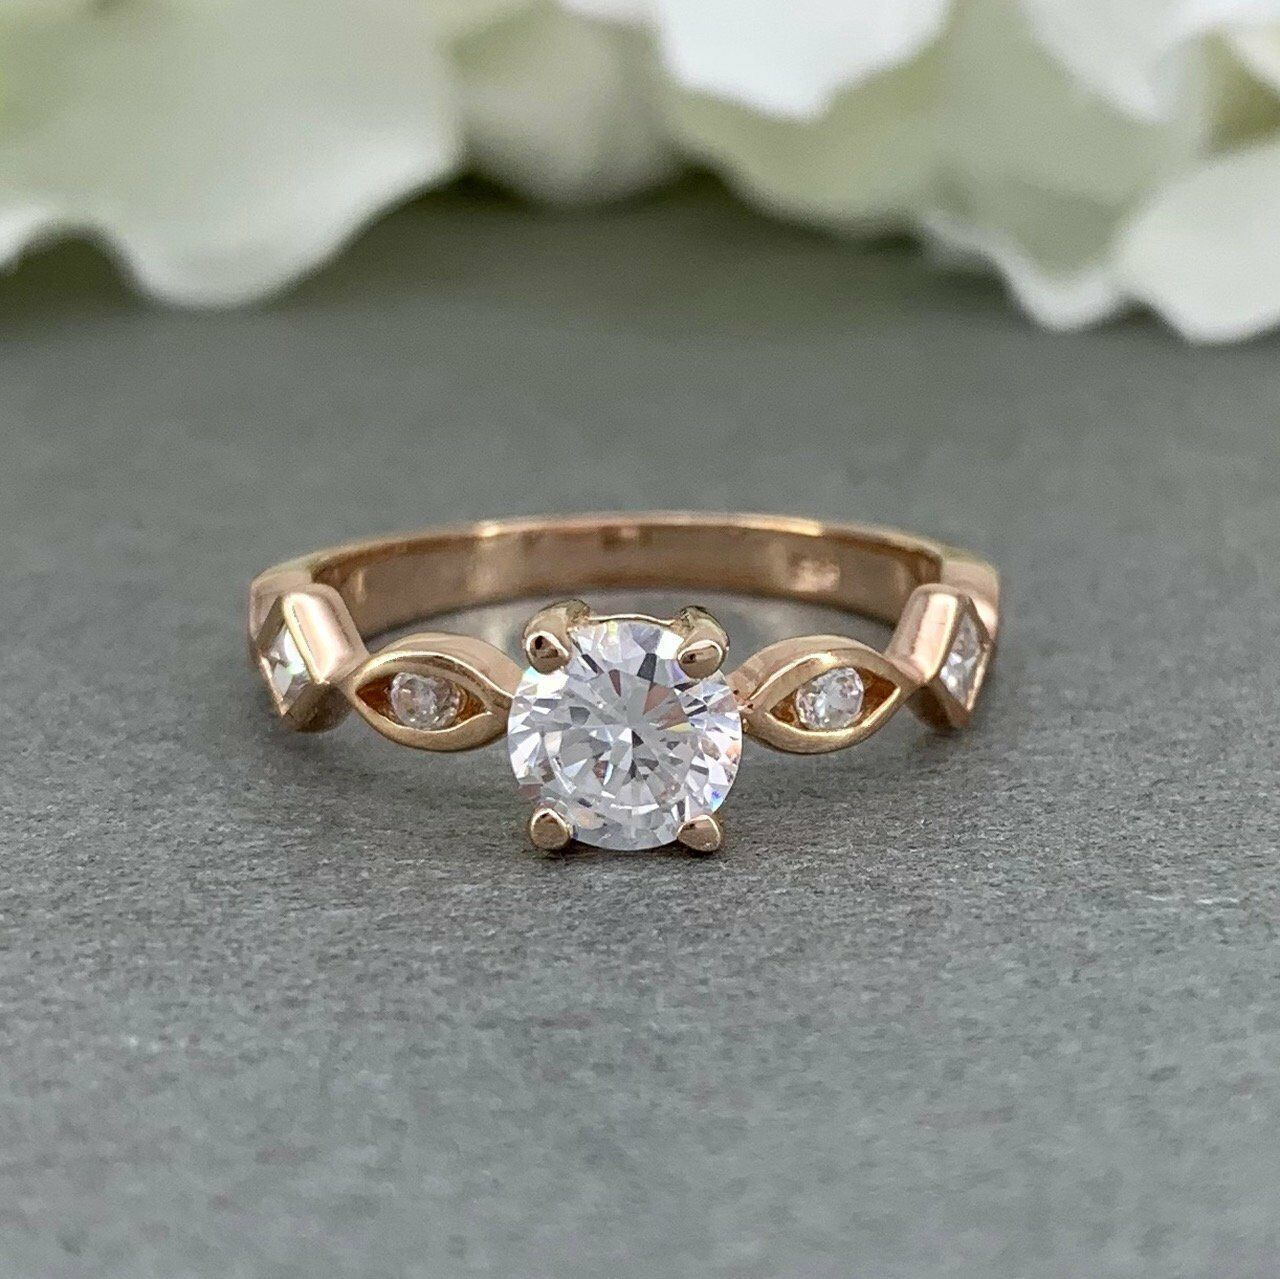 Hard-Working Diamond Three Stone Ring Vs1 Round Cut 0.81 Carat 18 Karat Yellow Gold Estate Vivid And Great In Style Diamond